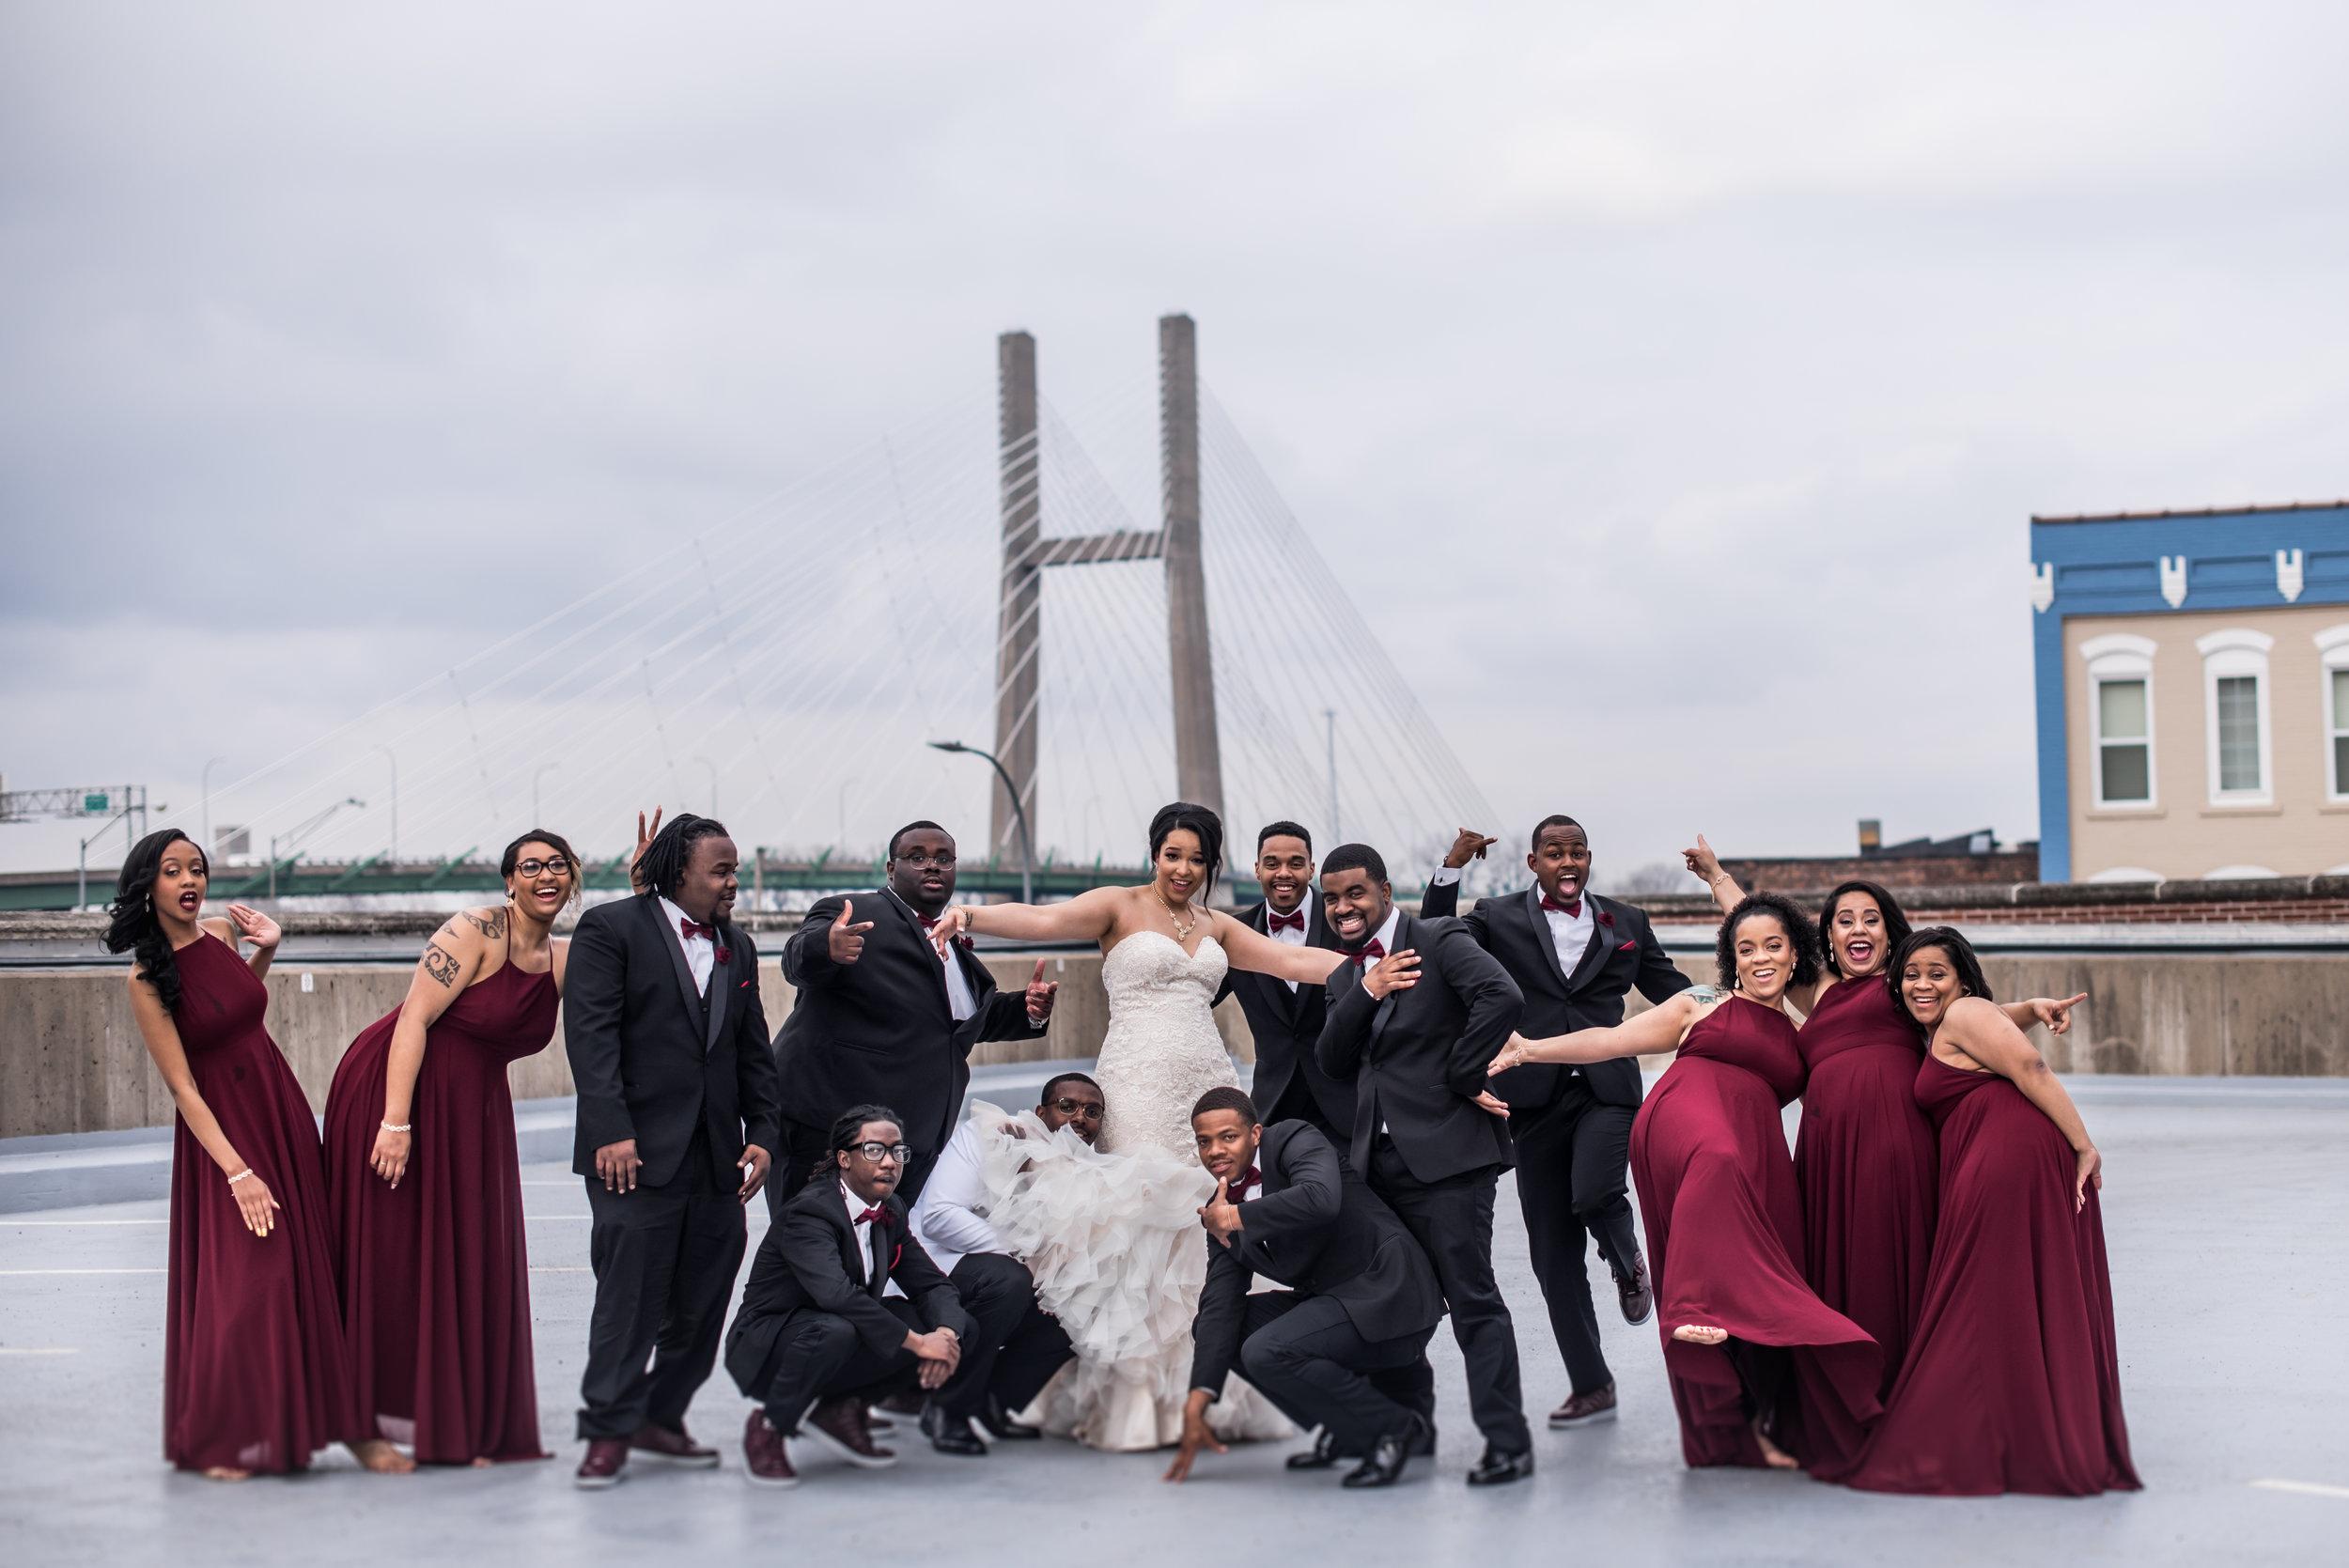 Burlington Iowa Wedding Midwest Photographer Melissa Cervantes _ Chantelle and Isaiah 610c.jpg